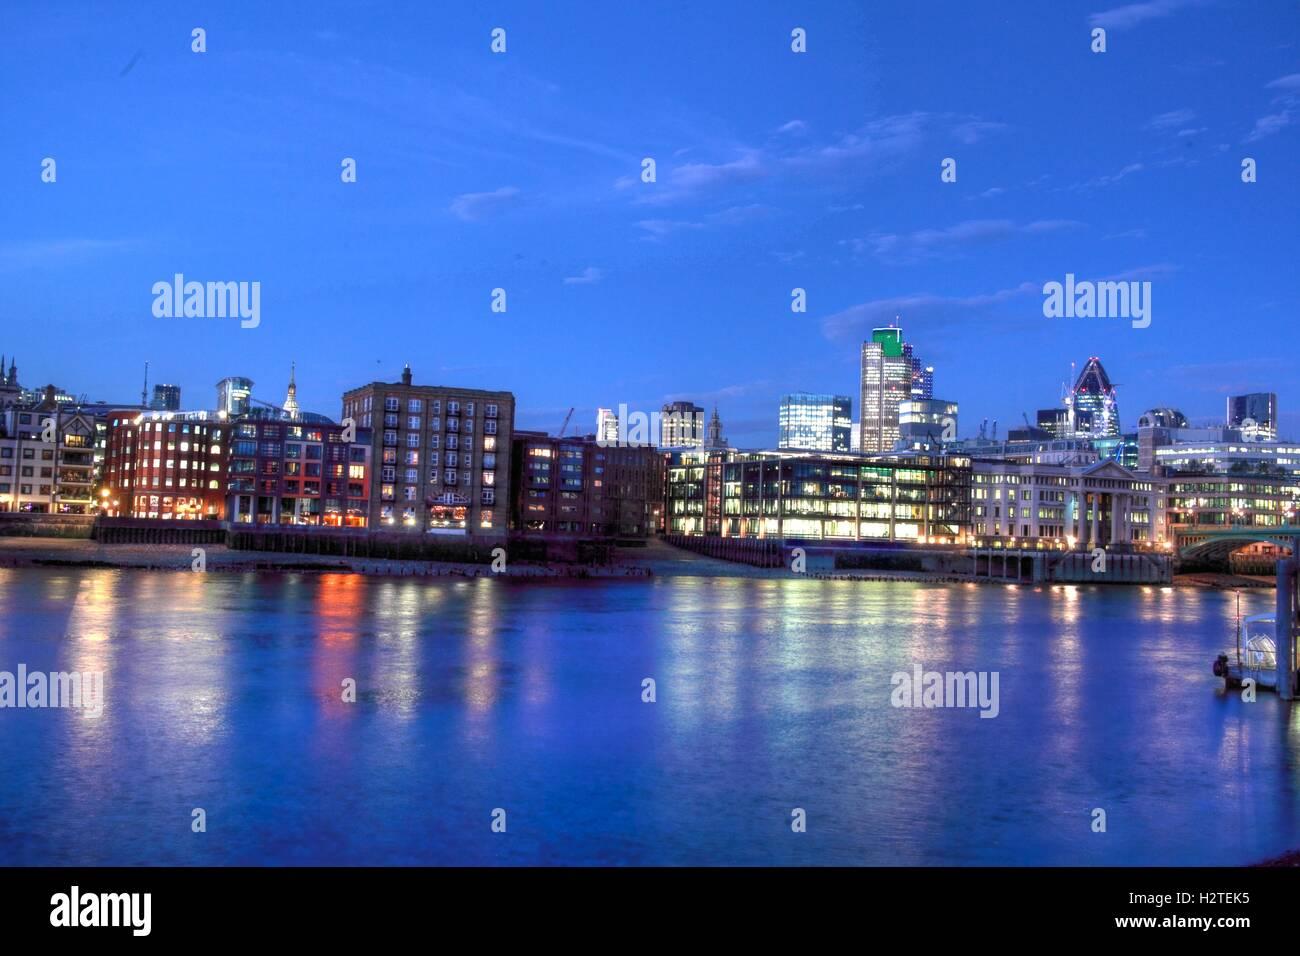 Laden Sie dieses Alamy Stockfoto Fluss Themse Panorama, London, England - H2TEK5